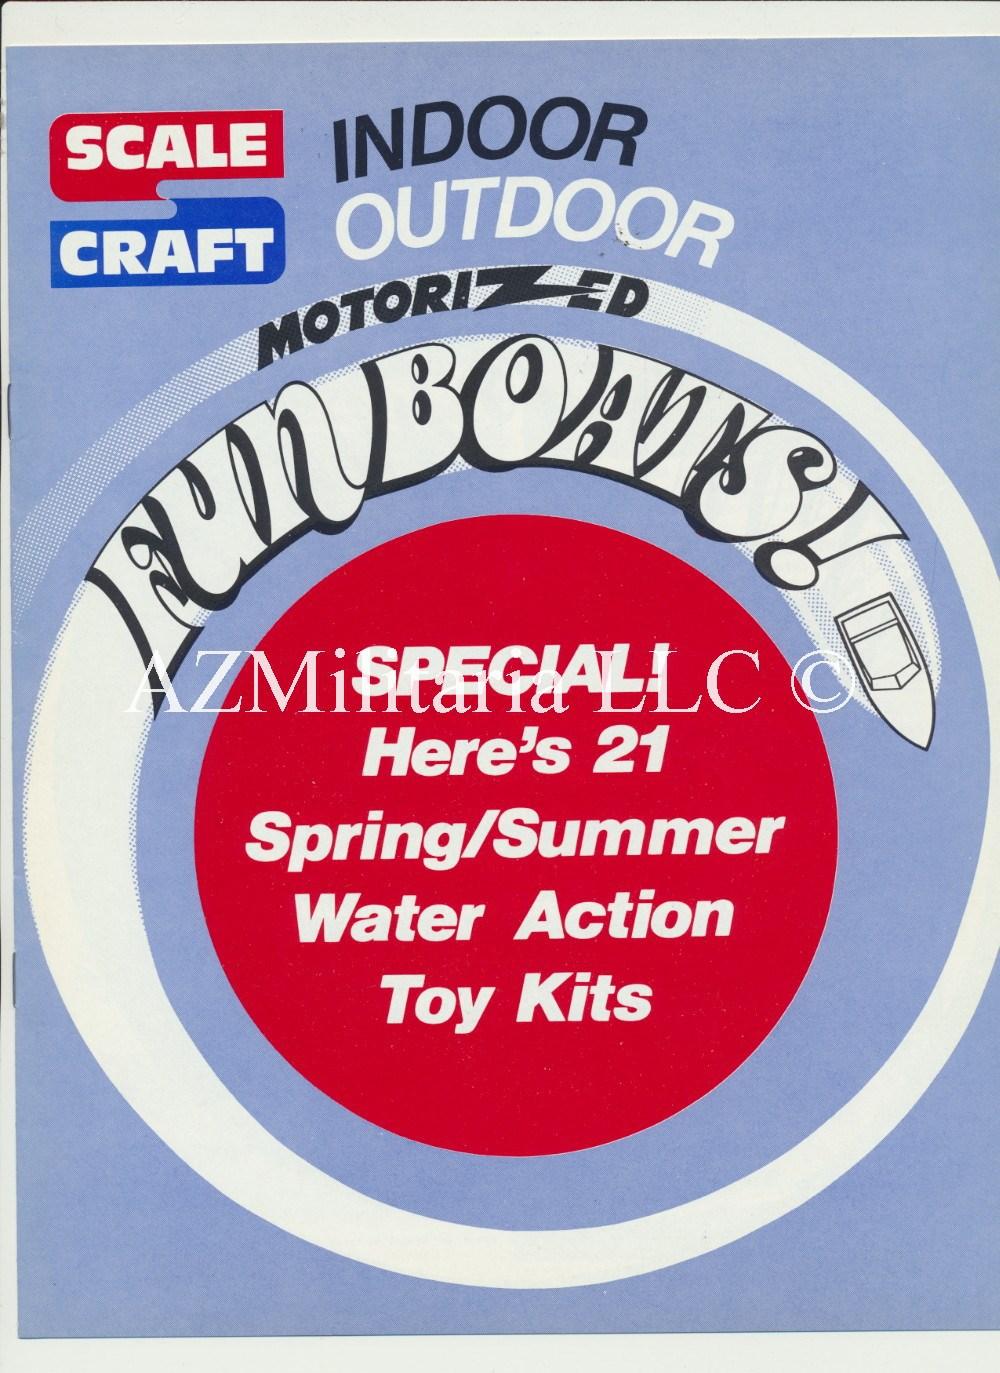 1979 Scale Craft Catalog